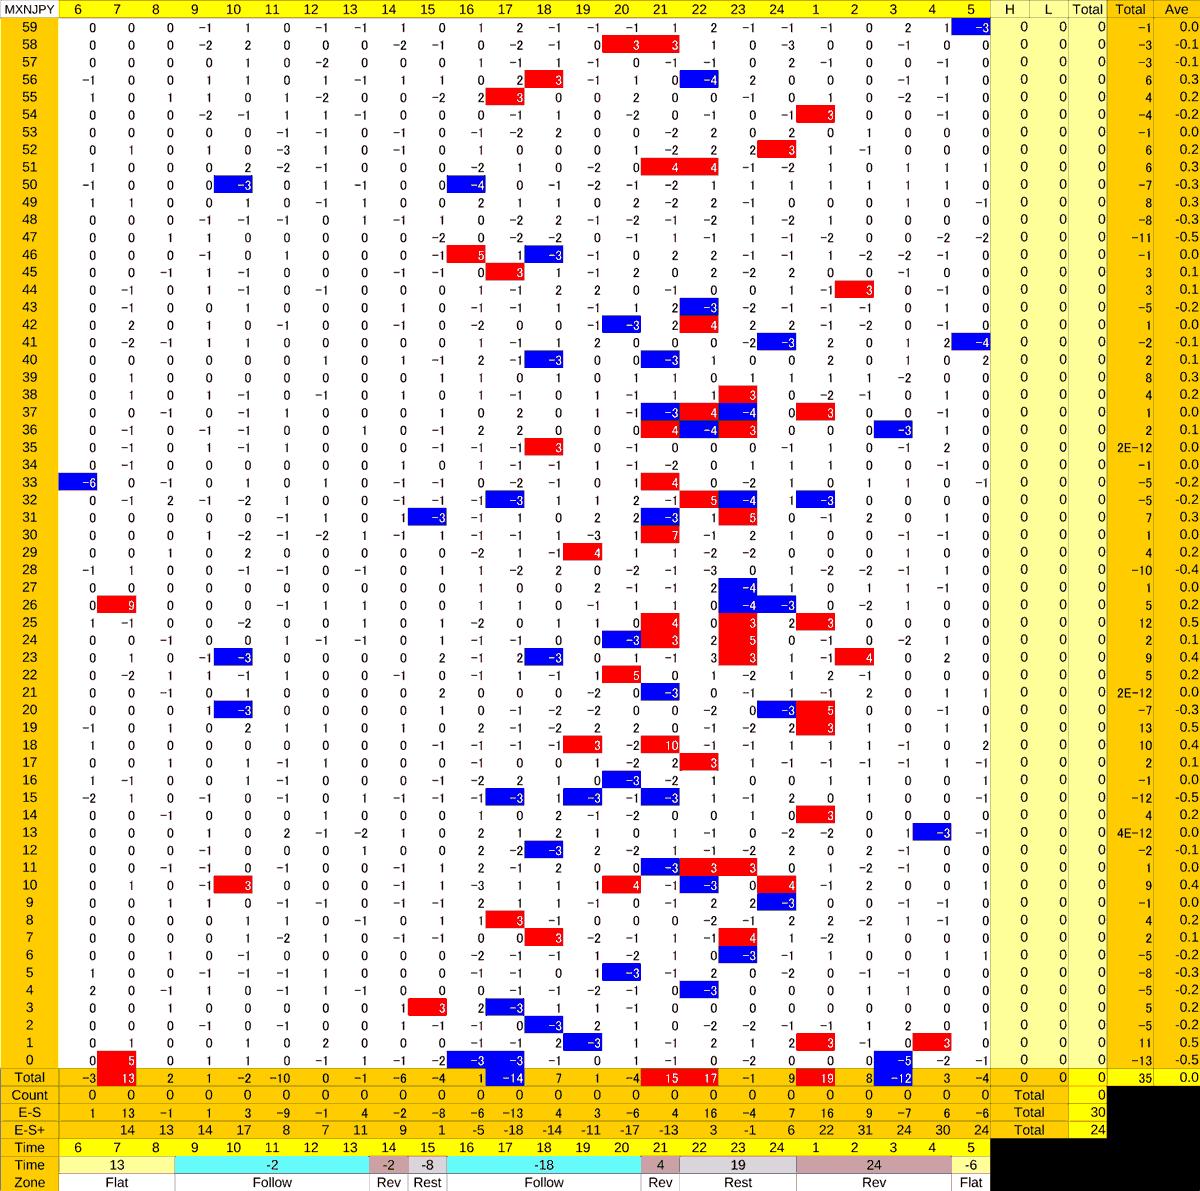 20201015_HS(3)MXNJPY